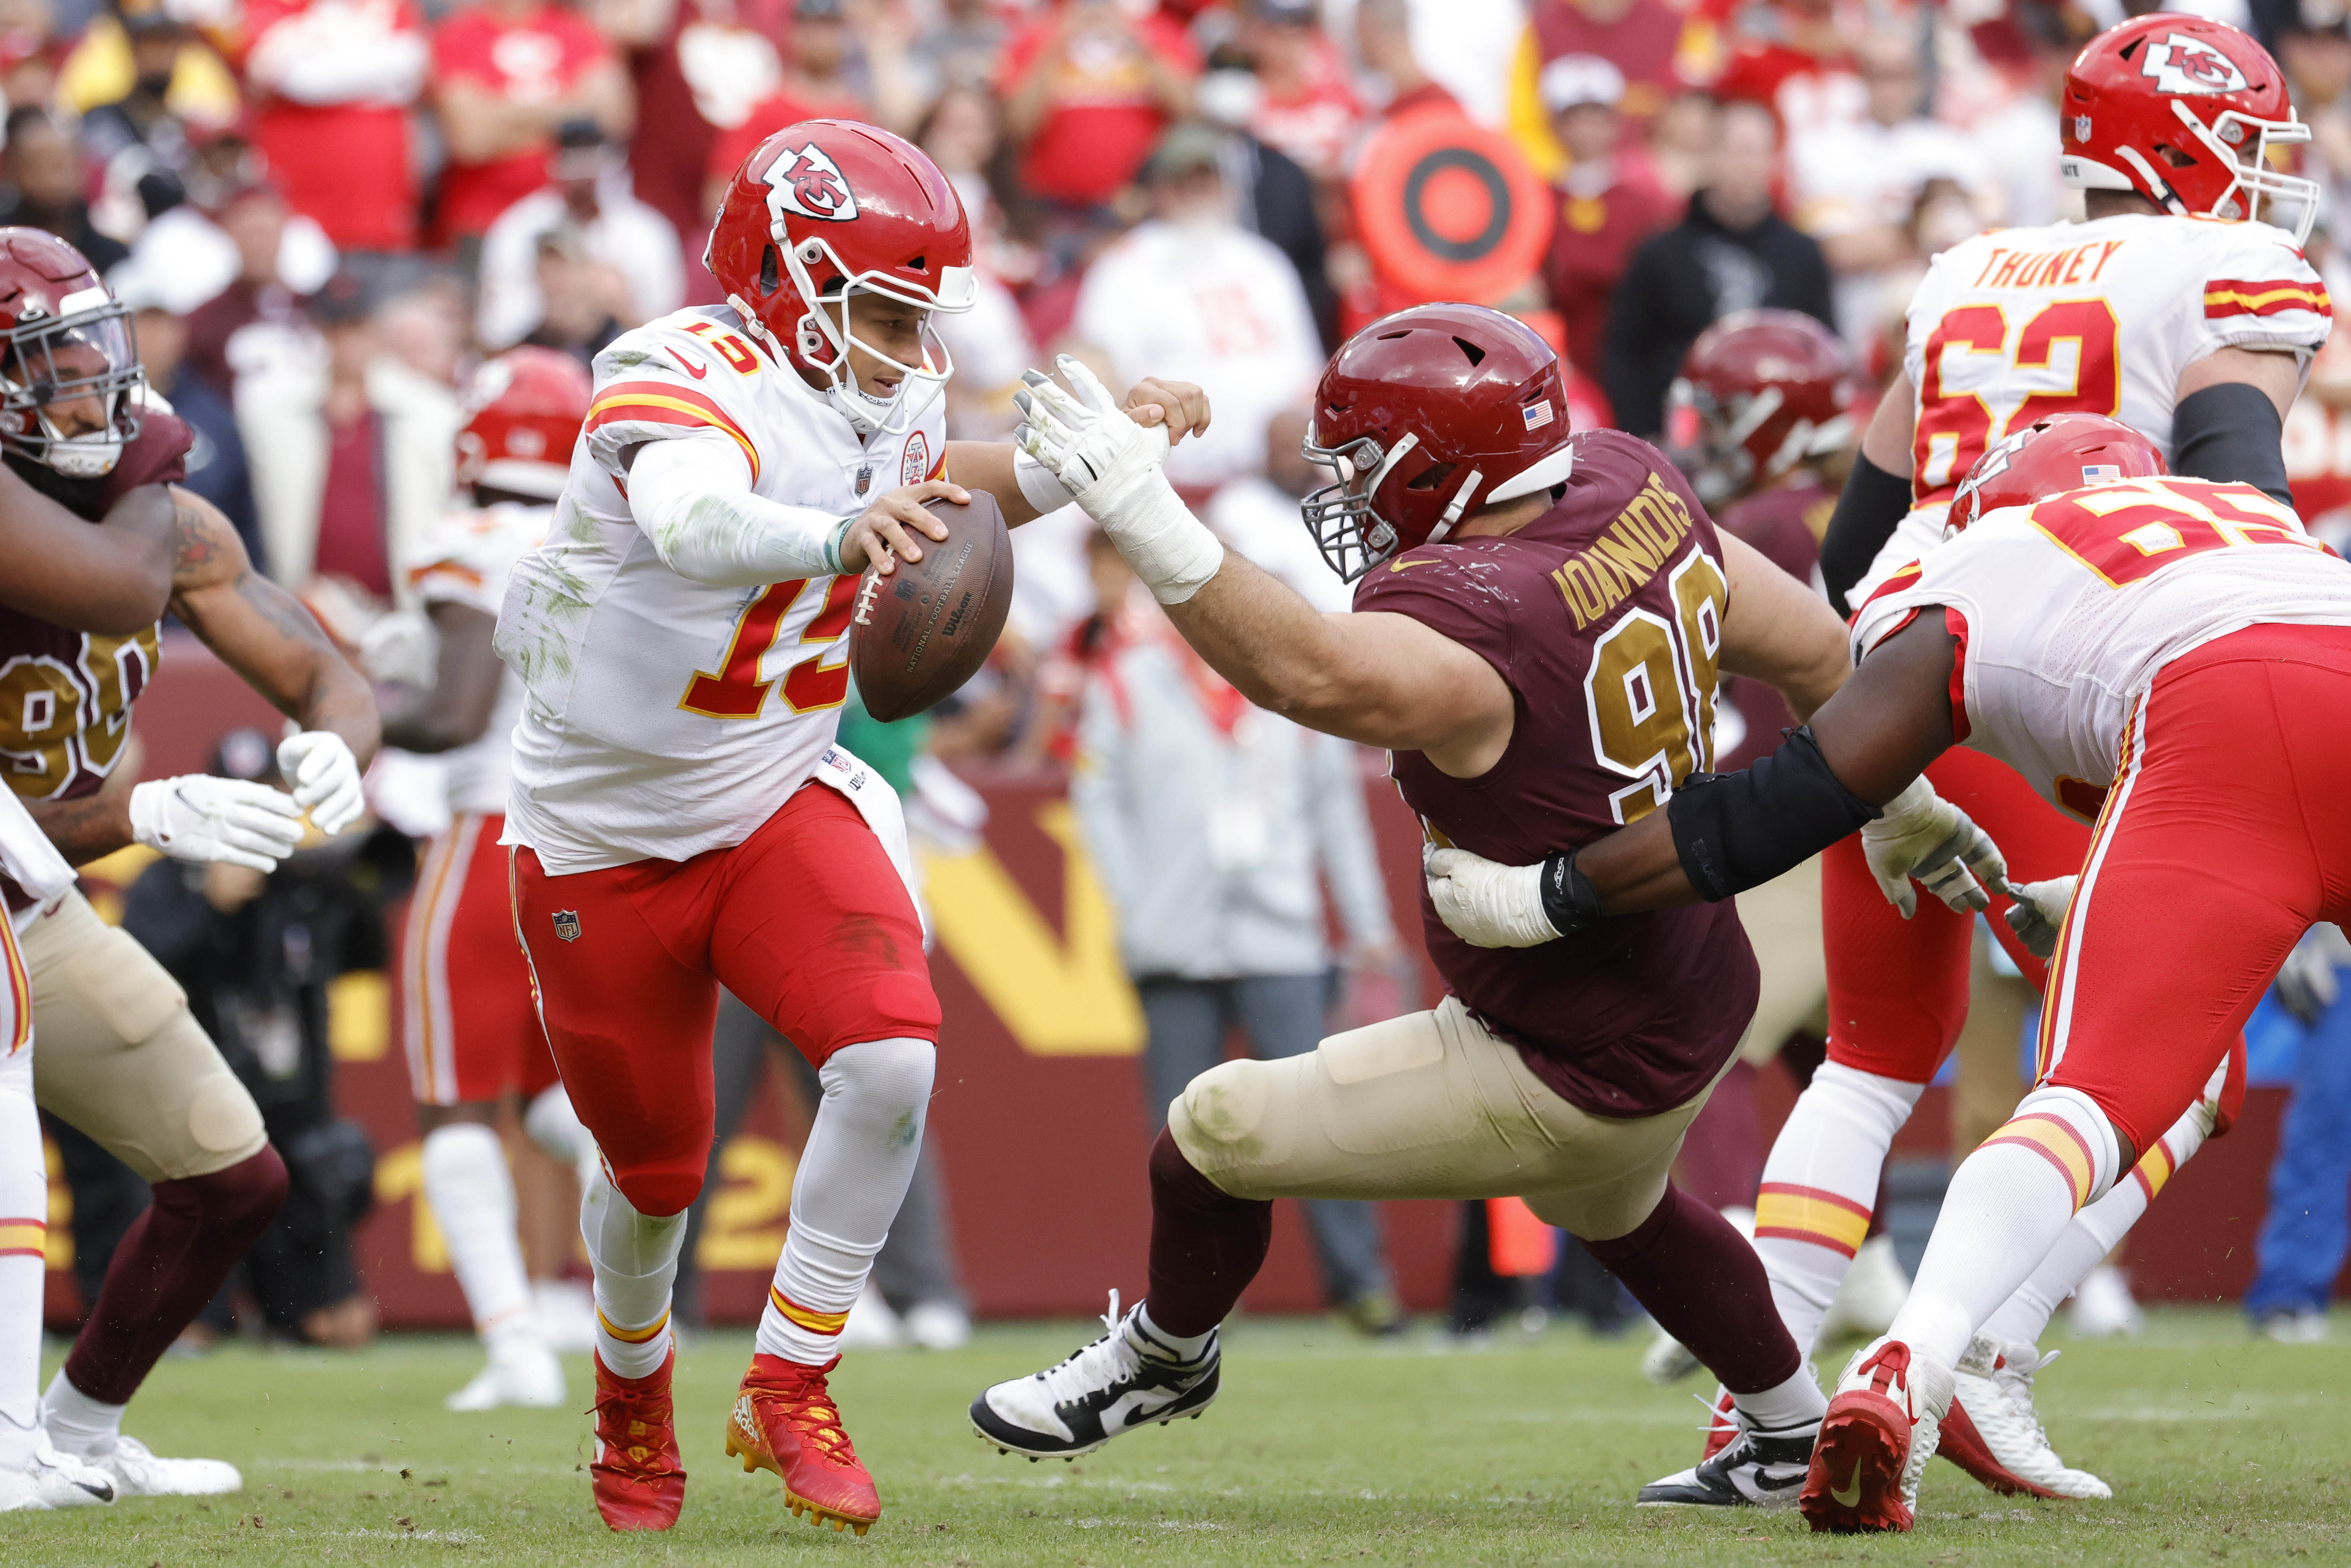 City Chiefs quarterback Patrick Mahomes (15) scrambles from Washington Football Team defensive tackle Matt Ioannidis (98) during the fourth quarter at FedExField.